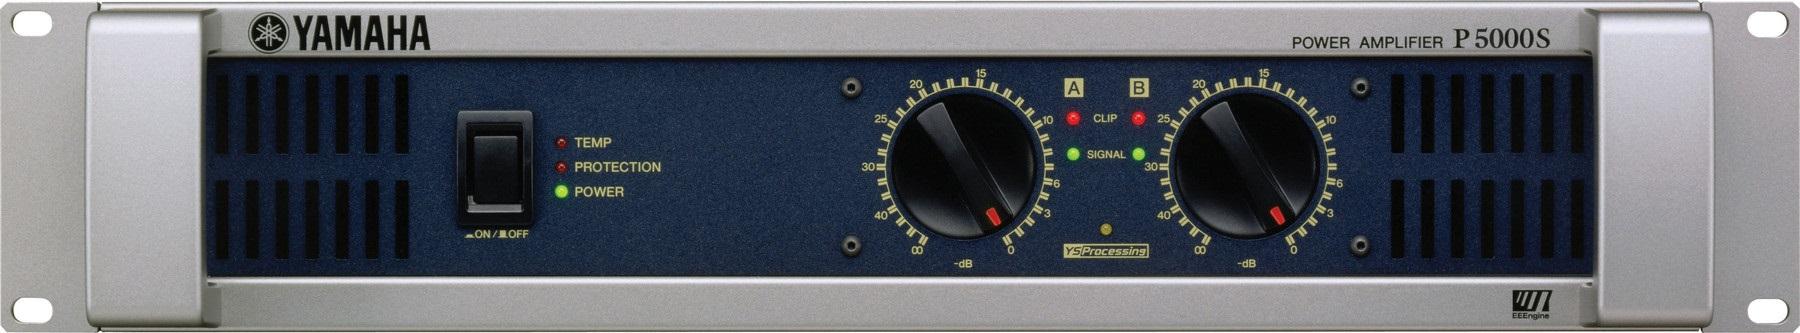 Yamaha P 5000S